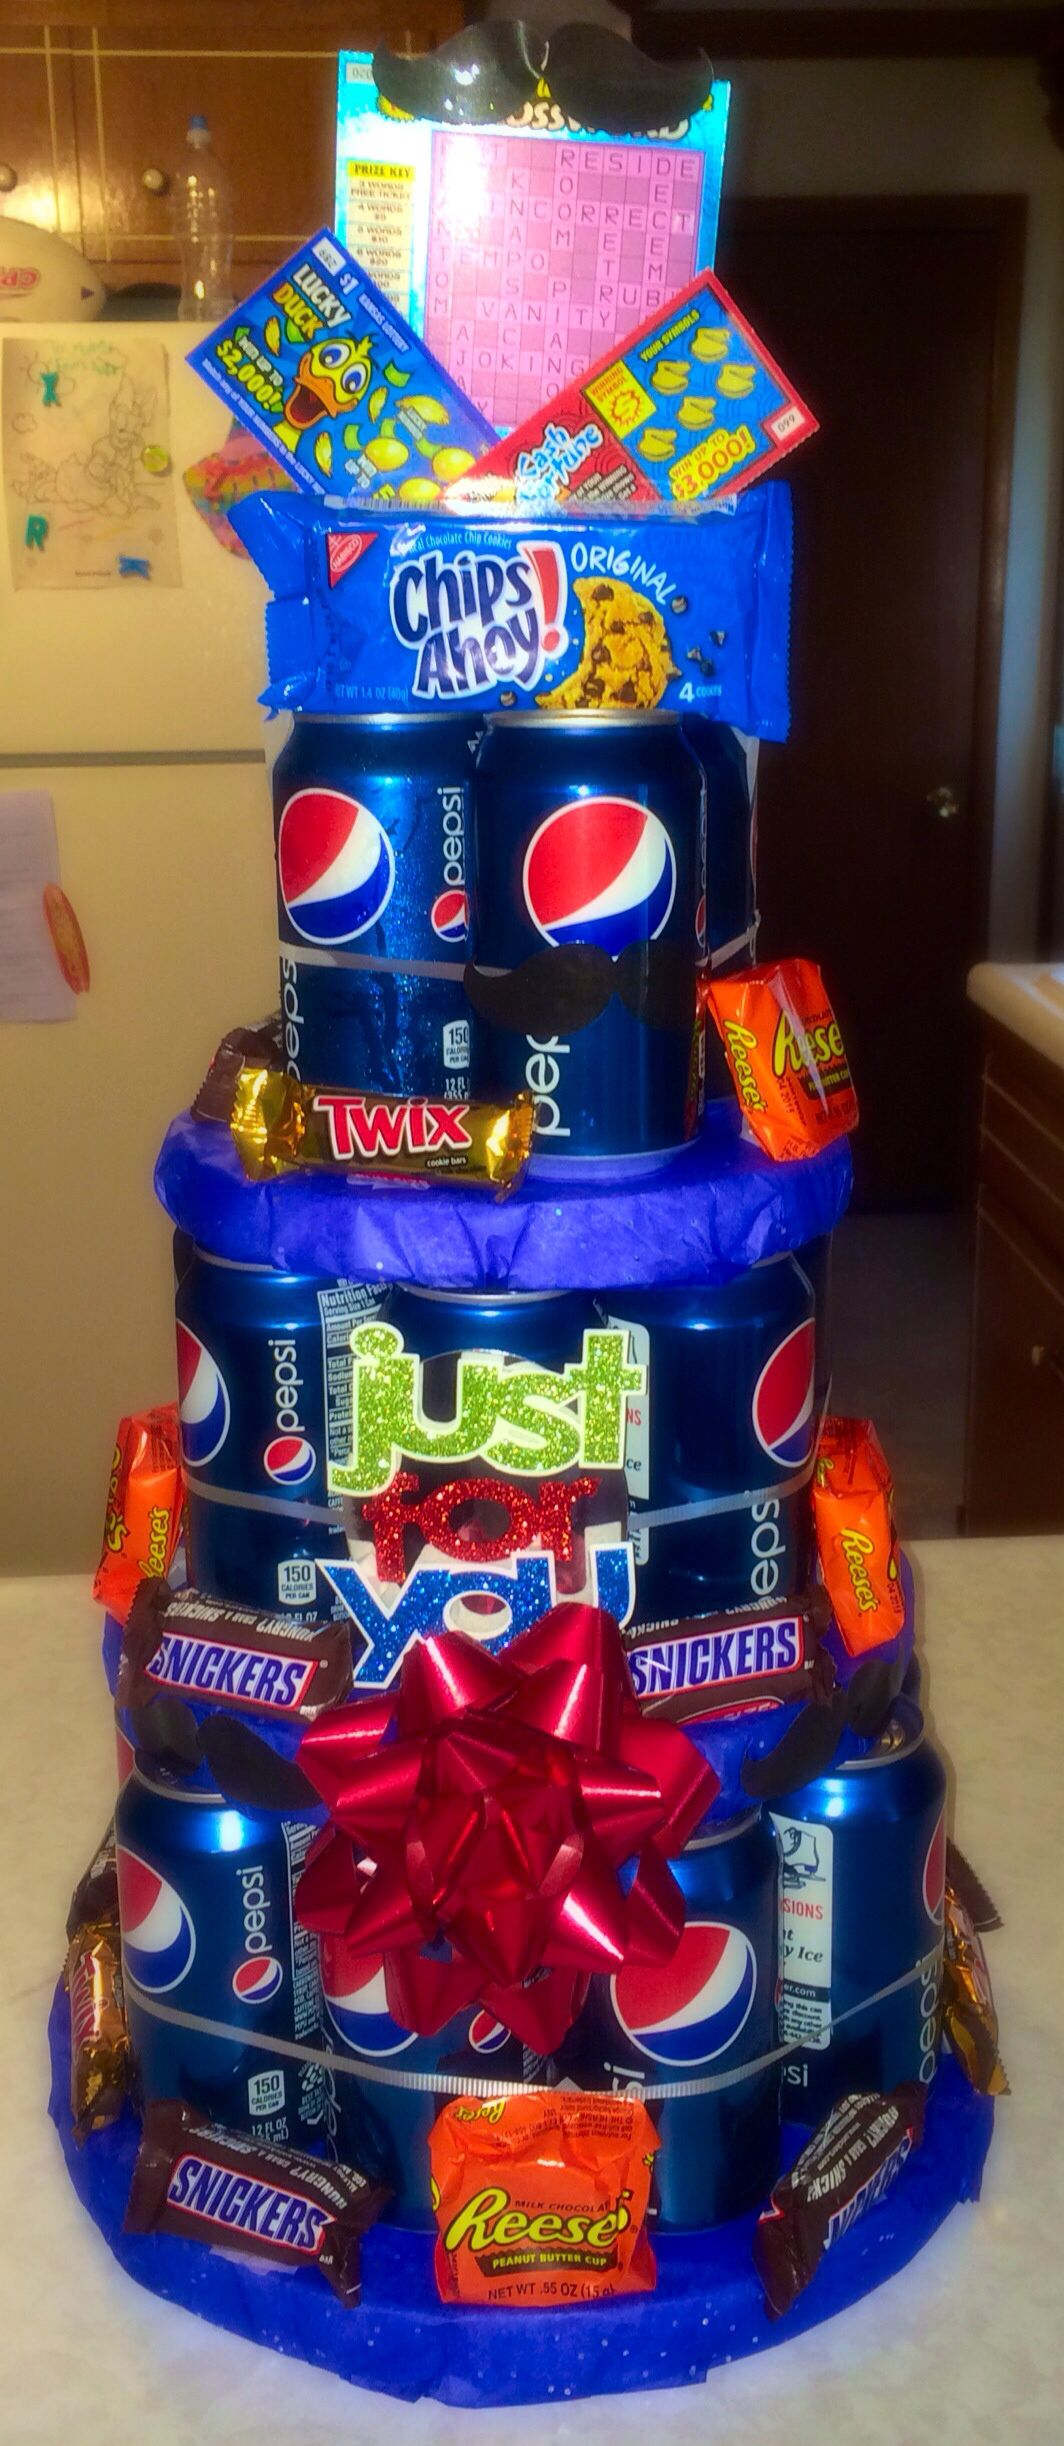 BeerCanCake Easy DIY Birthday Gifts for Boyfriend Handmade